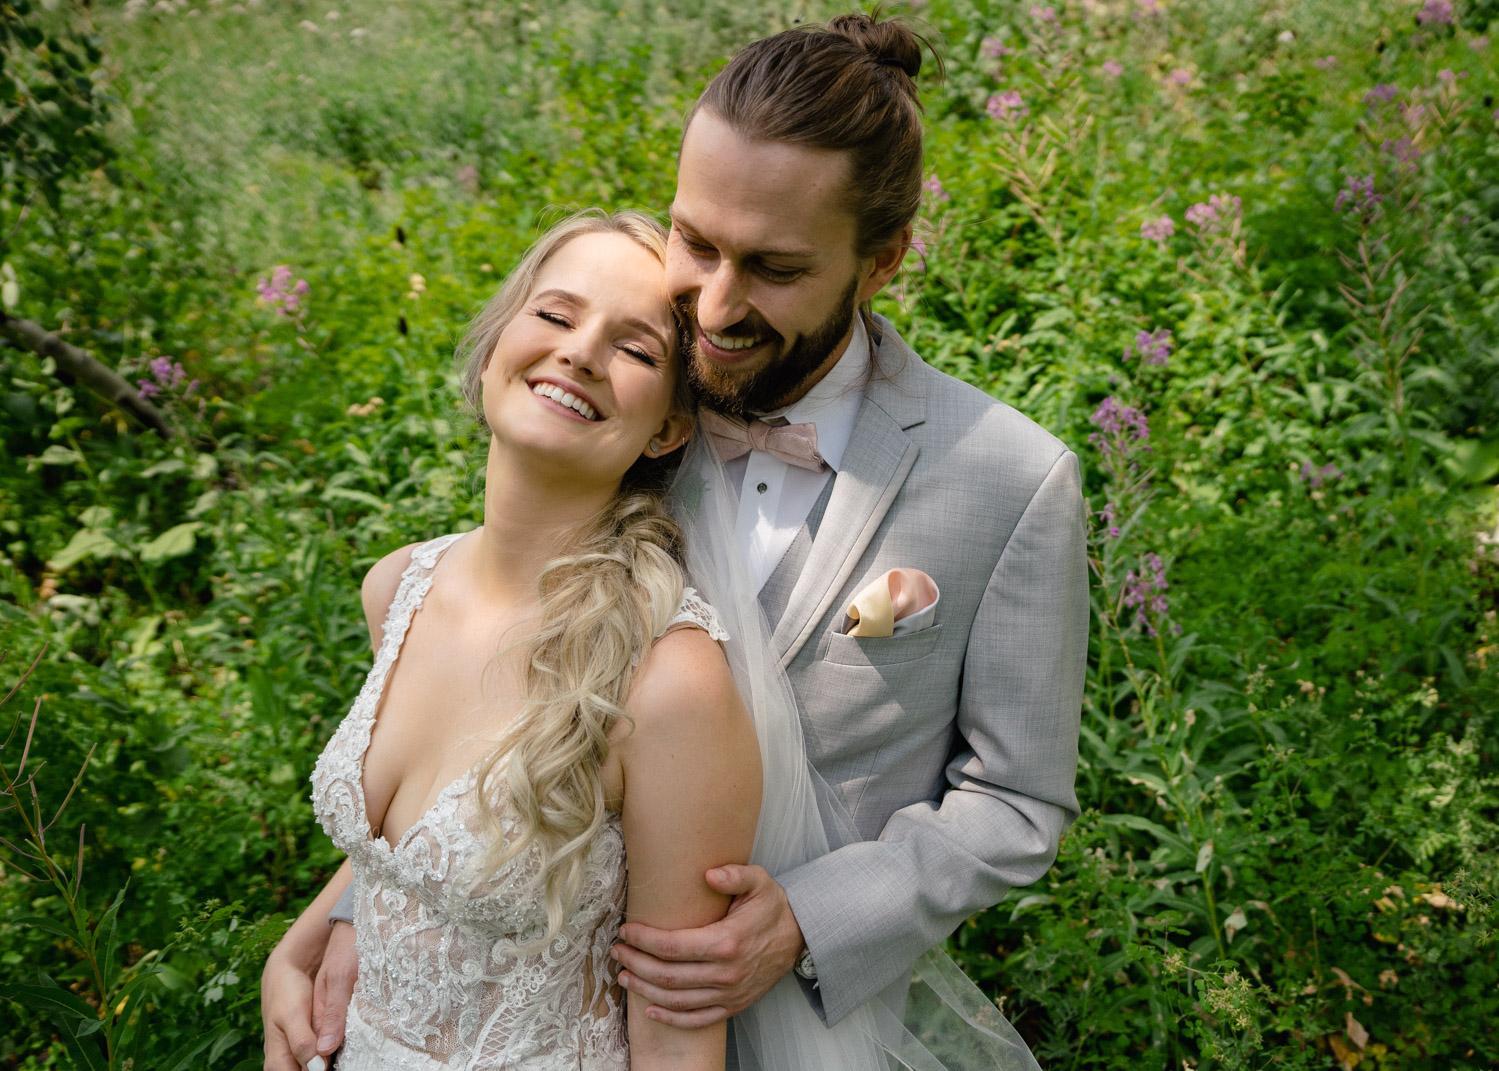 joyful bride and groom in wild flowers alta lodge